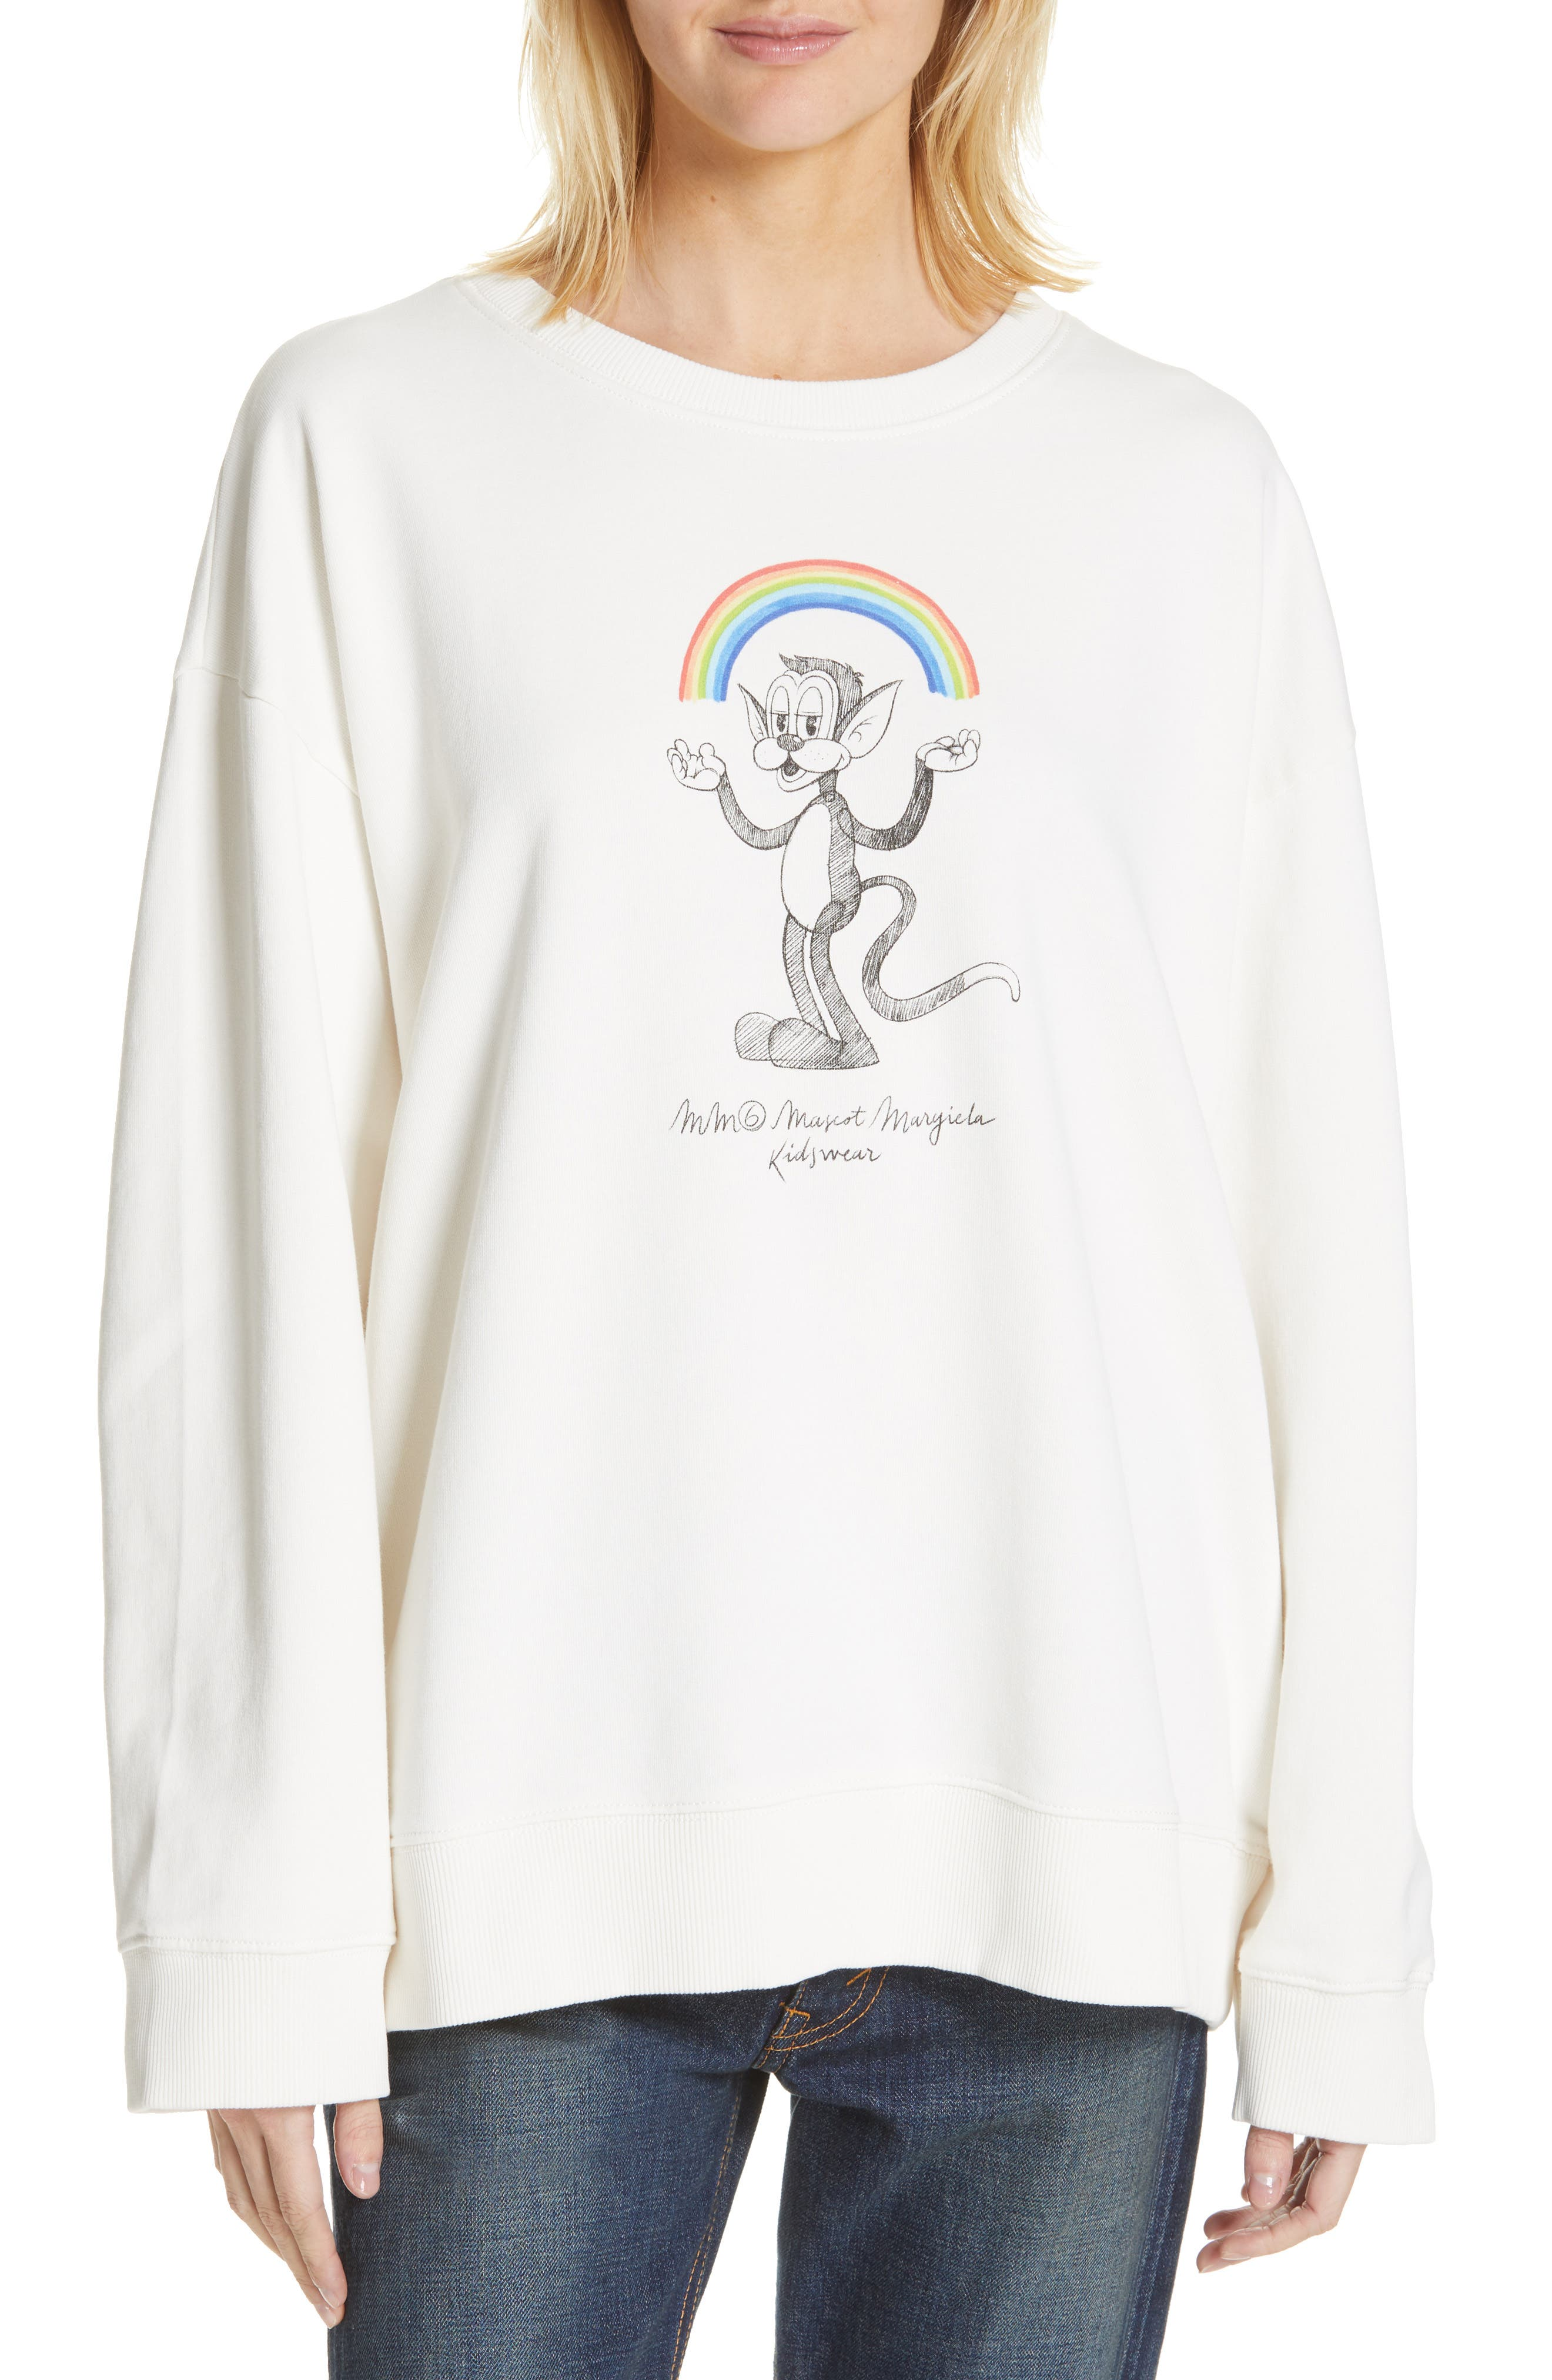 MM6 MAISON MARGIELA Kidswear Mascot Graphic Sweatshirt, Main, color, OFF WHITE